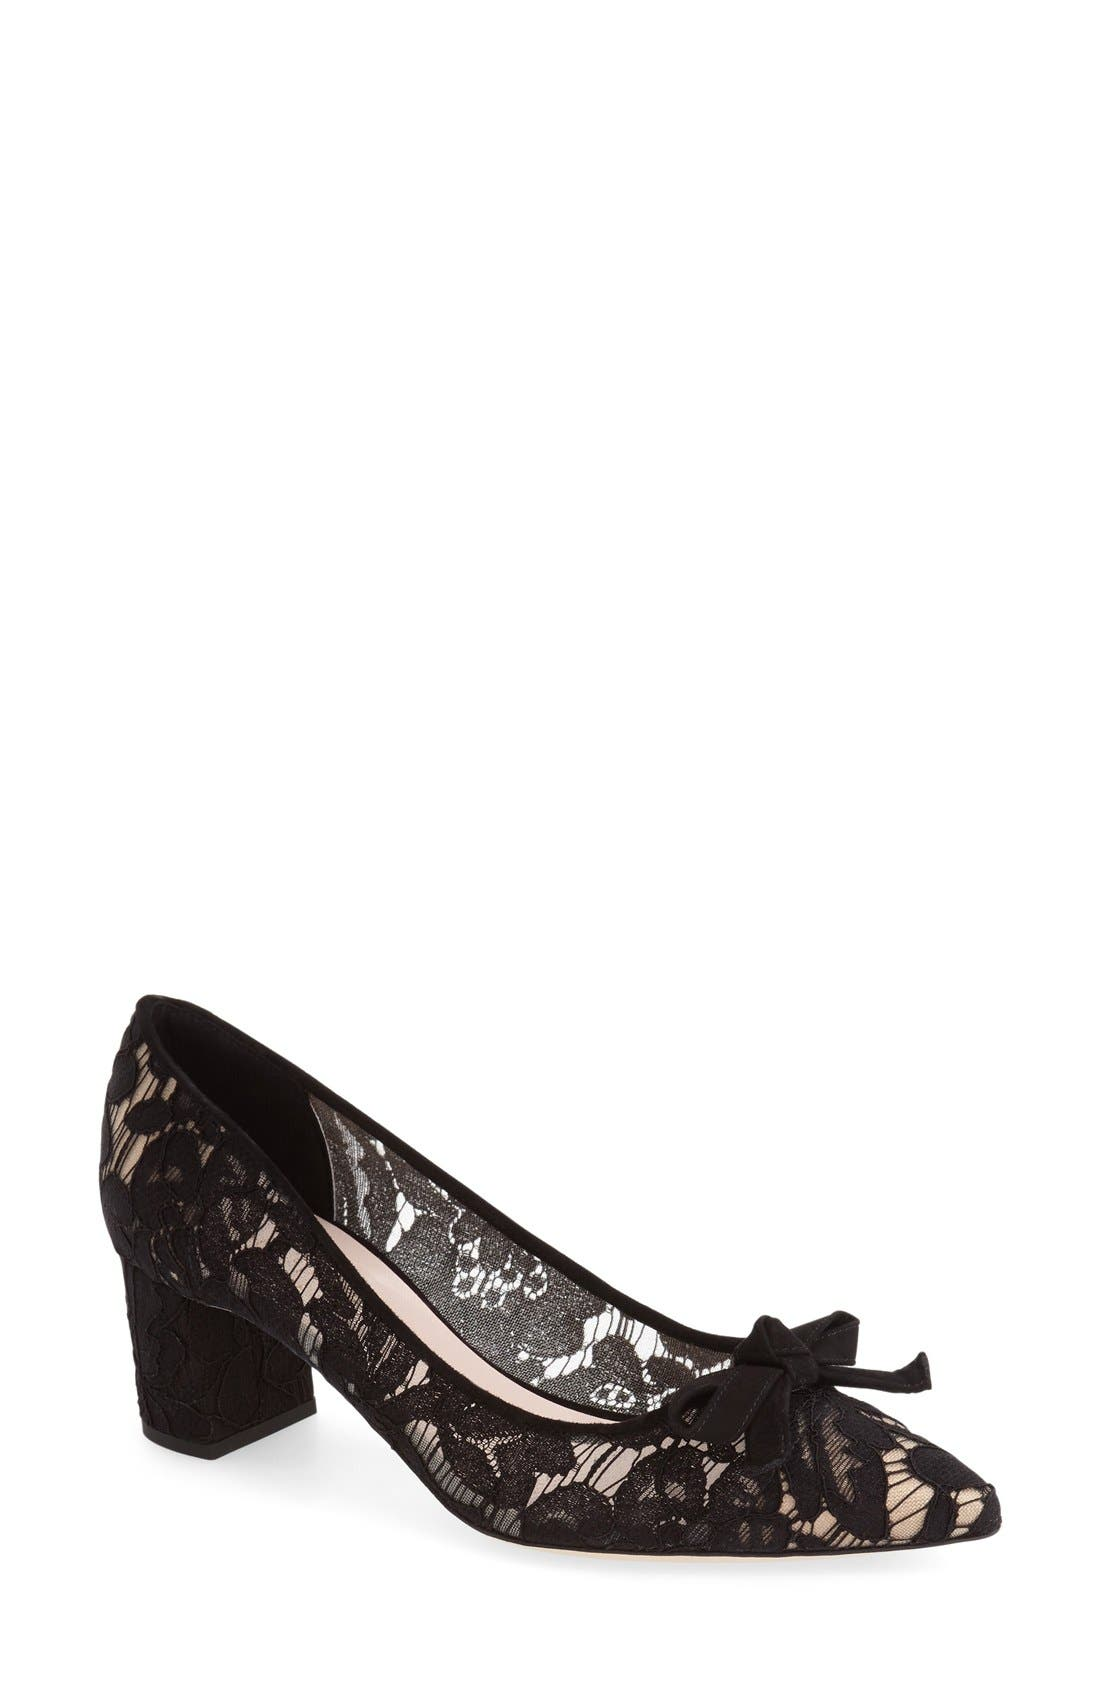 Alternate Image 1 Selected - kate spade new york 'madelaine' block heel pump (Women)